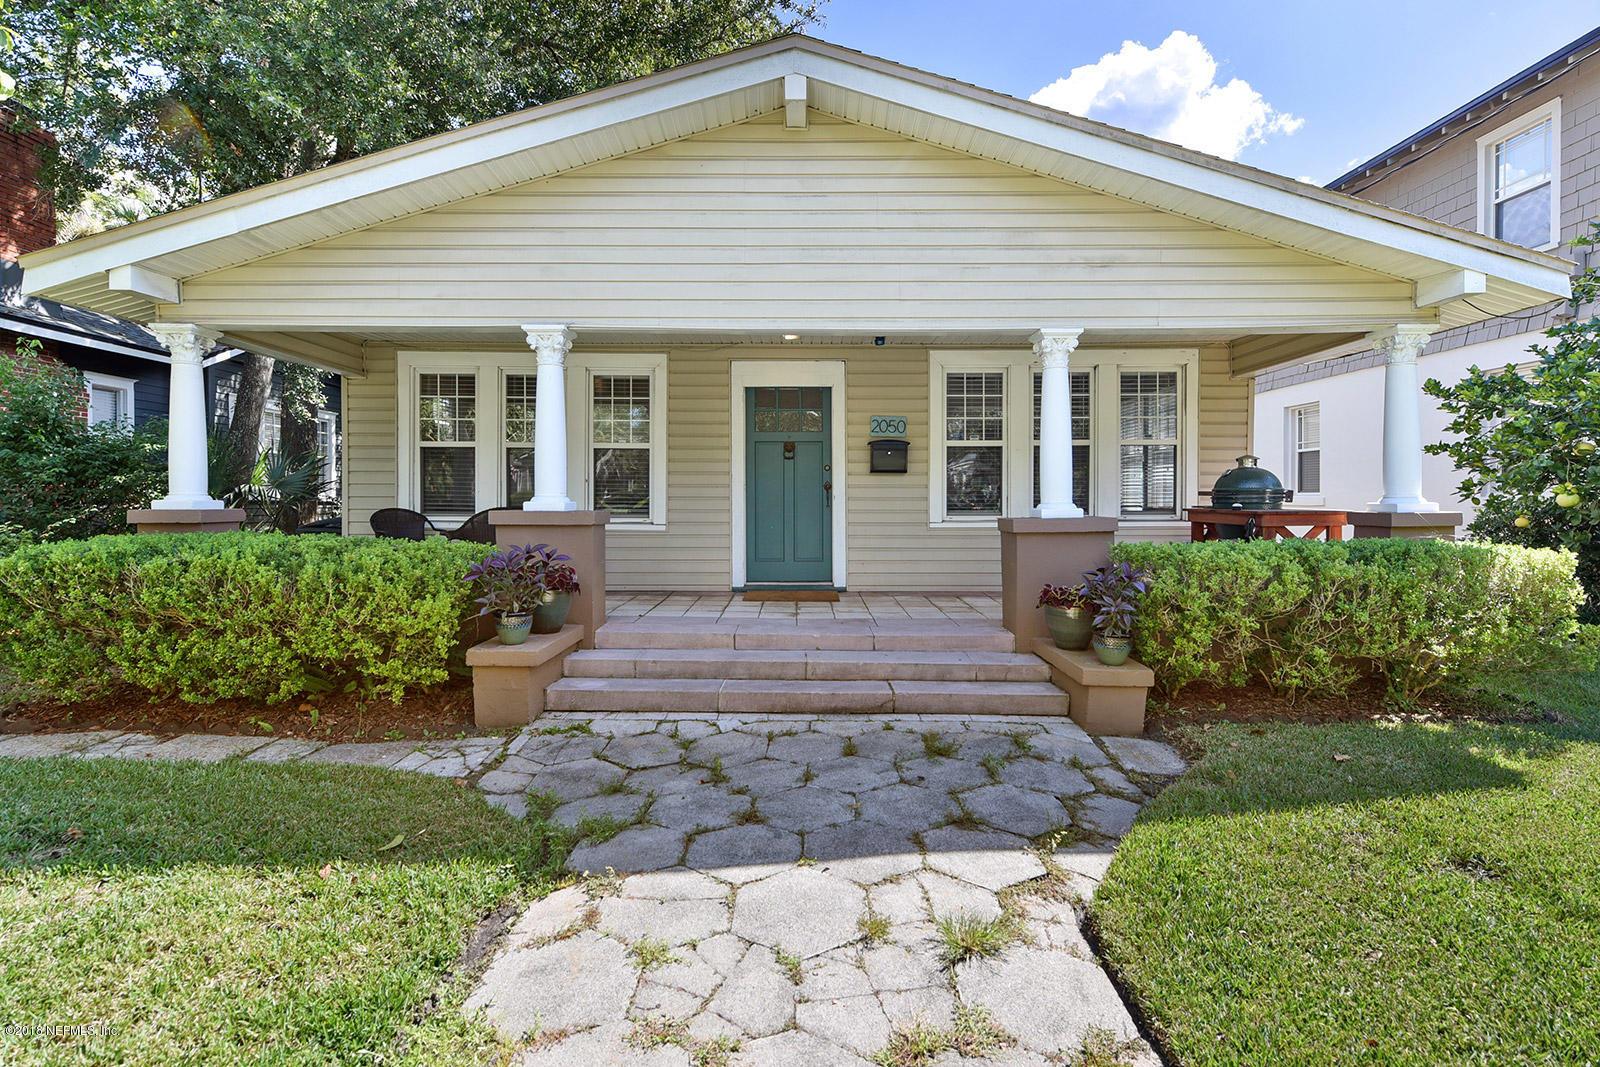 2050 Myra, JACKSONVILLE, FLORIDA 32204, 3 Bedrooms Bedrooms, ,2 BathroomsBathrooms,Residential - single family,For sale,Myra,960606